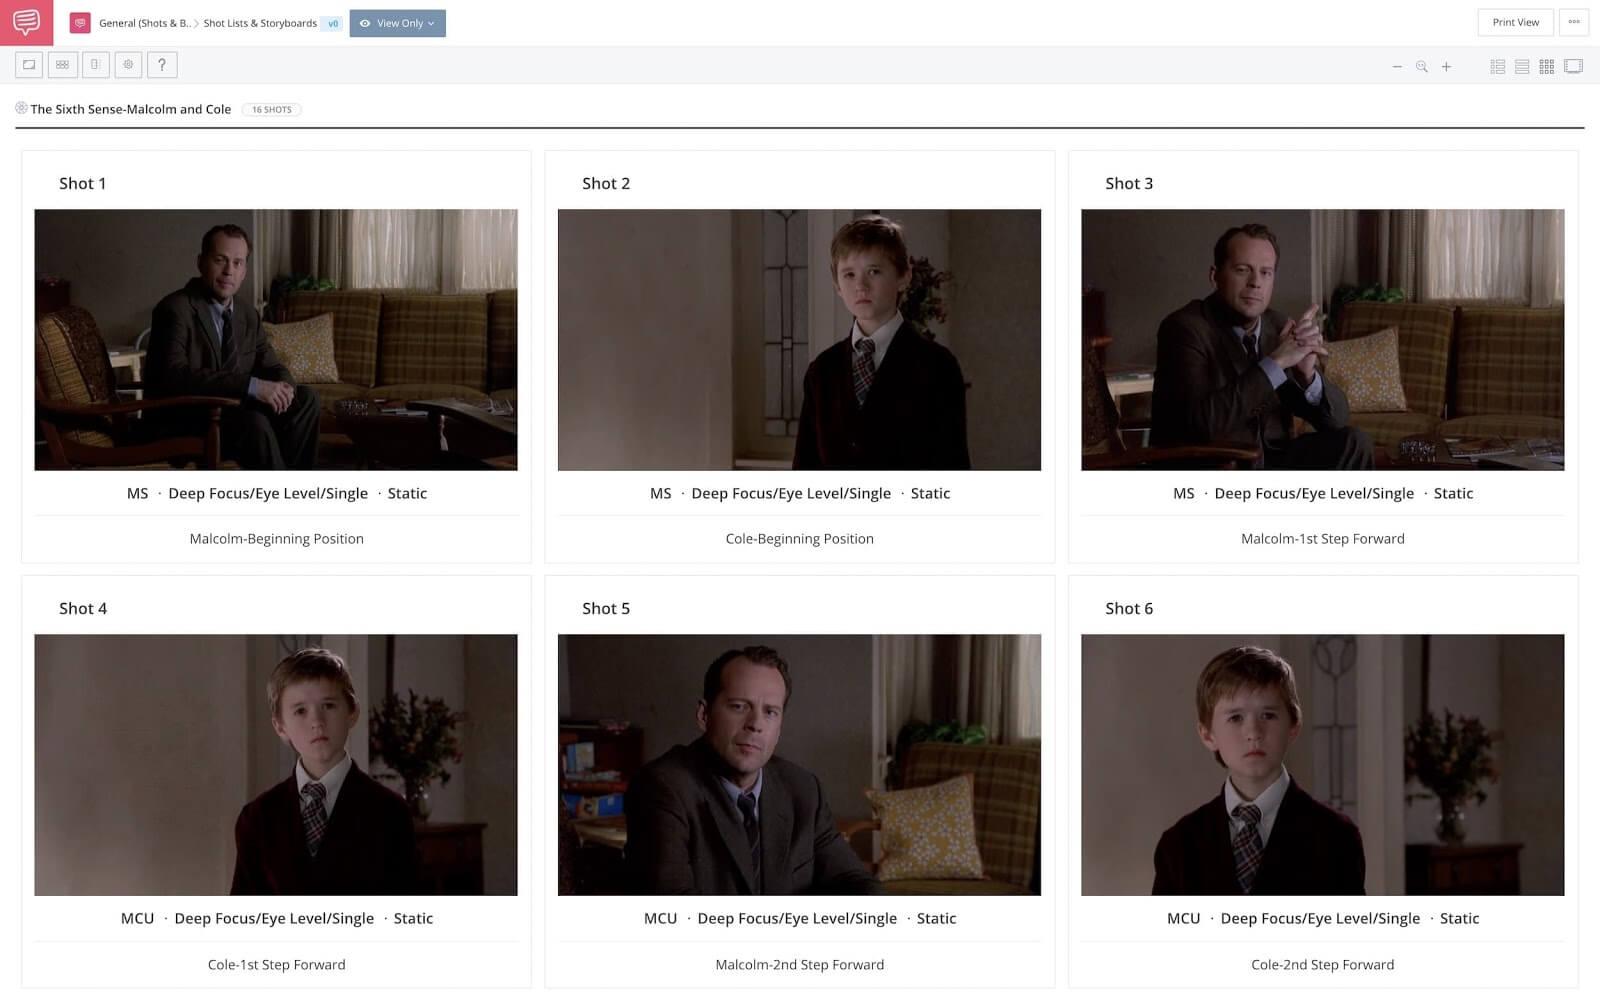 M Night Shyamalan Movies - Directing Style - The Sixth Sense - StudioBinder Online Shot List Software